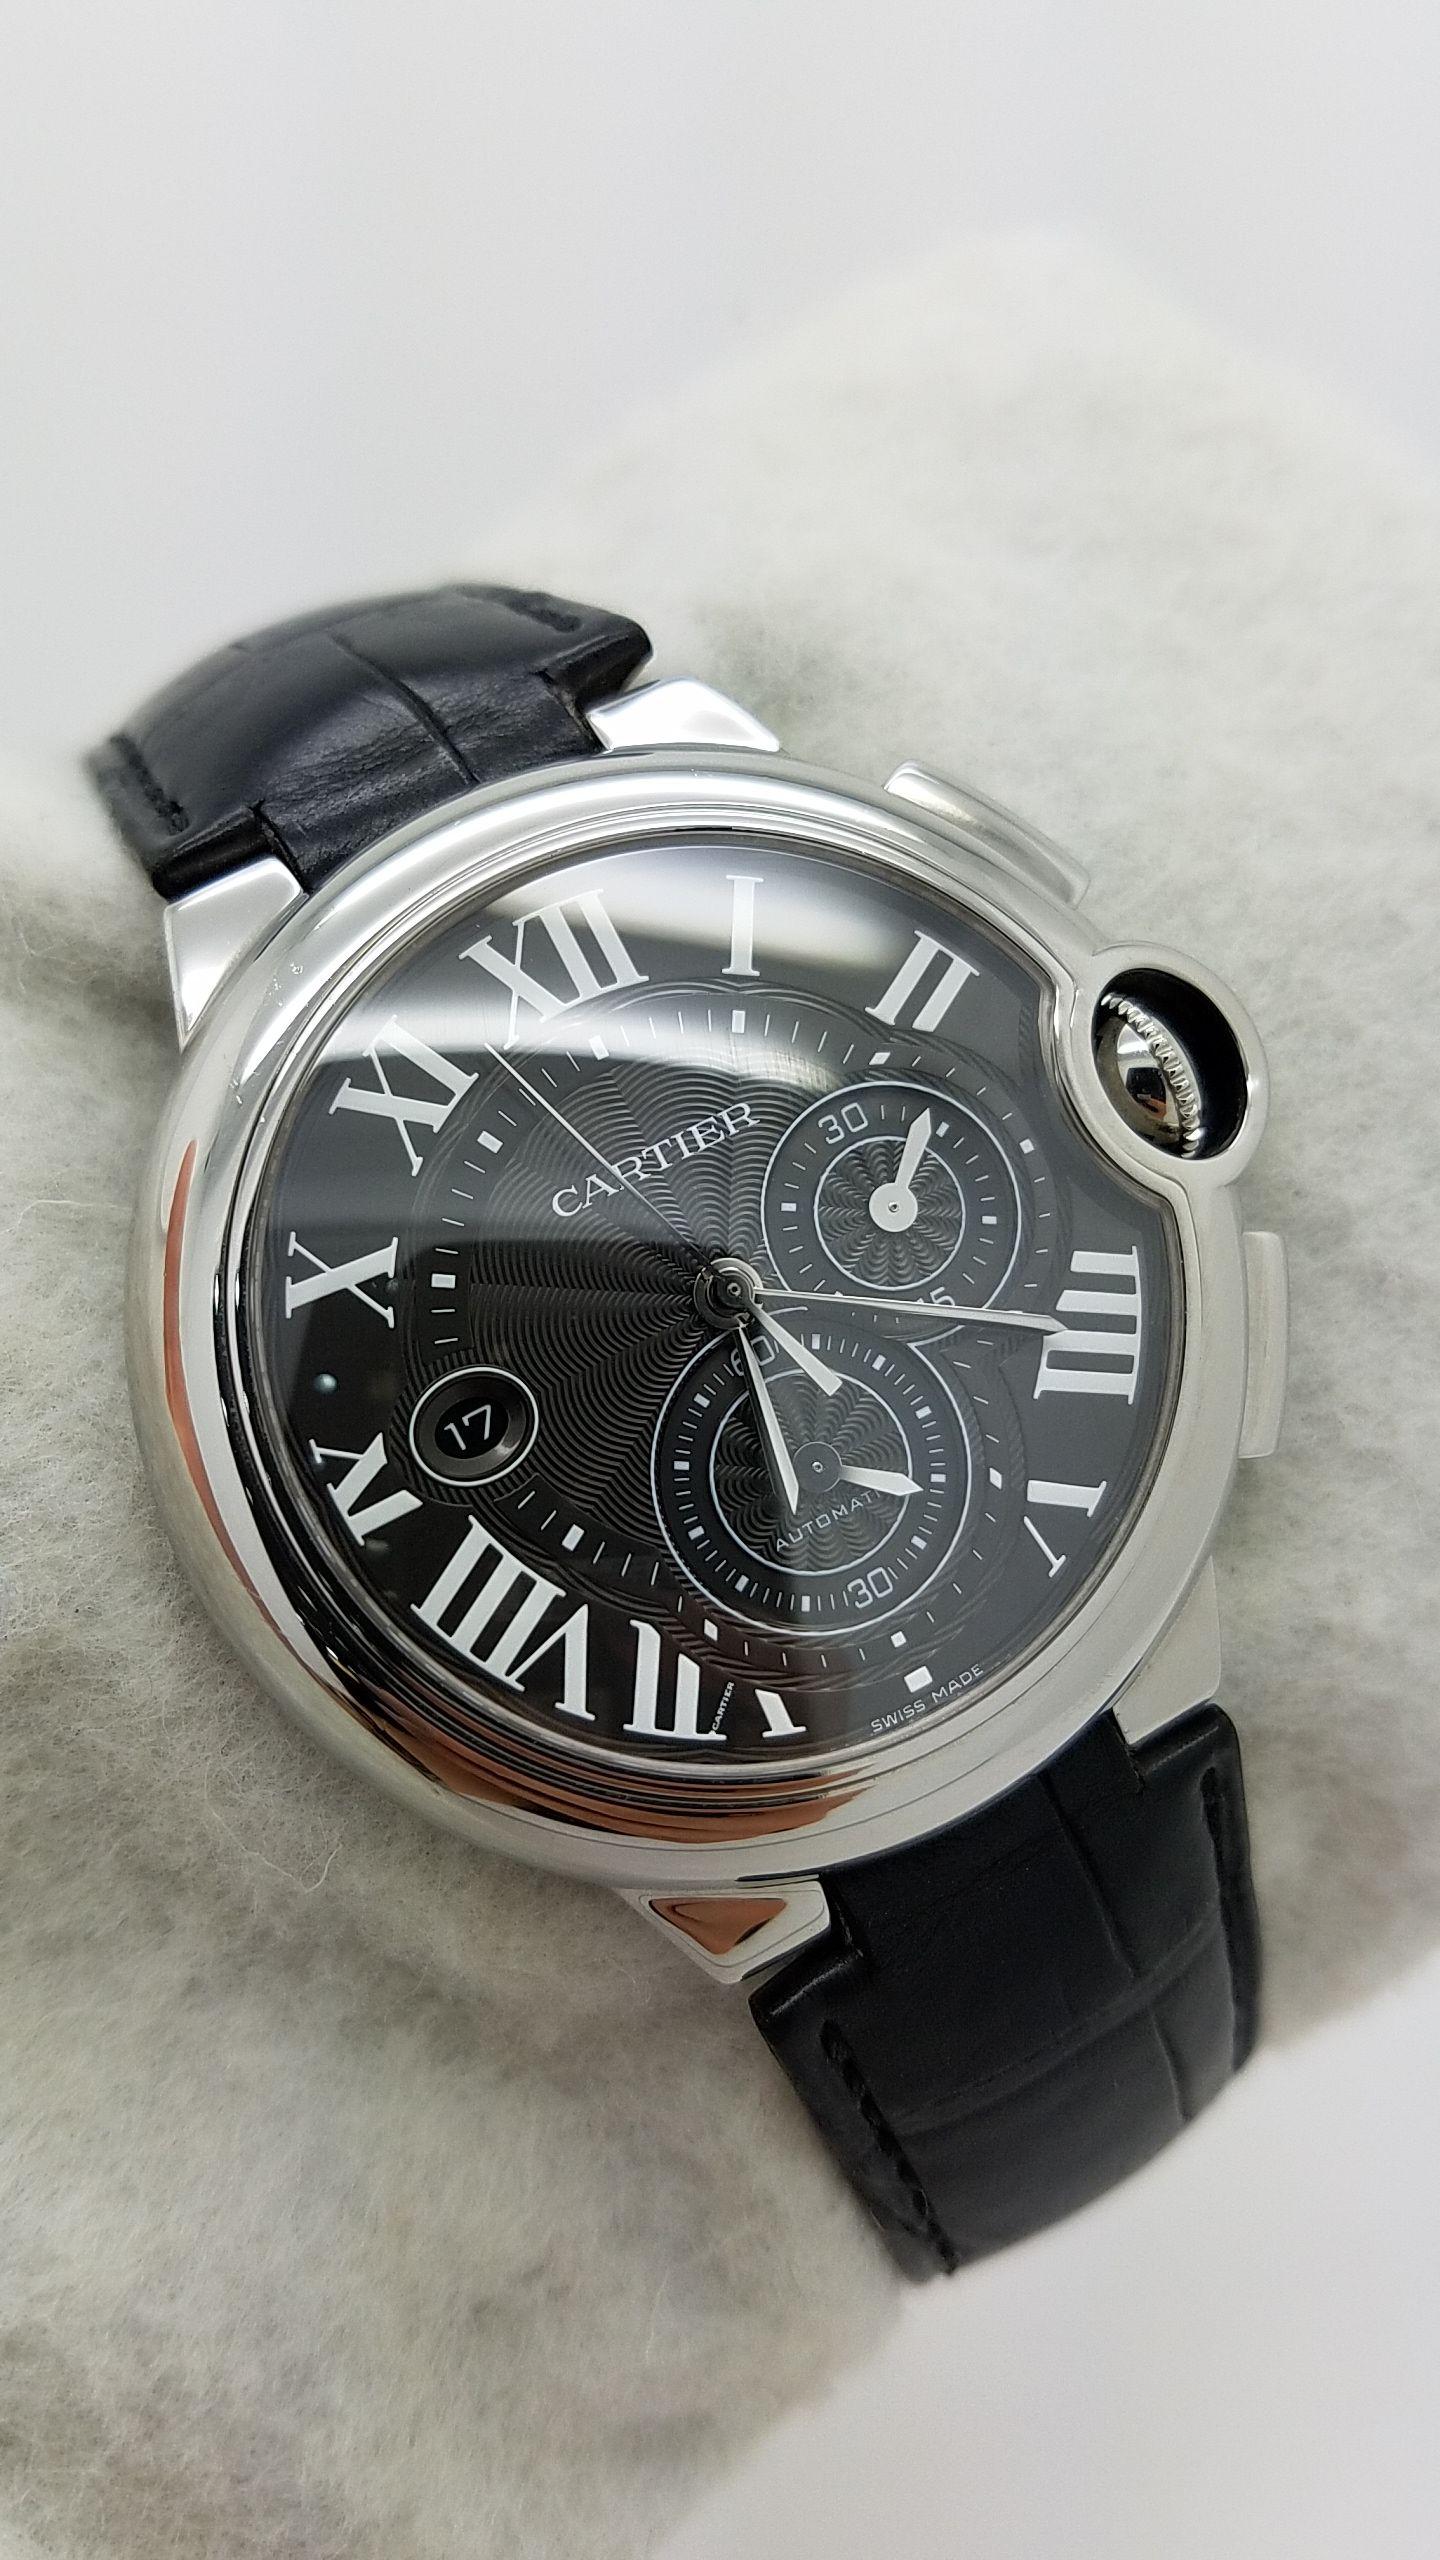 e9cc77ef32f7c CARTIER BALLON BLEU chronograph 3109 – W6920052 BLACK roman Stainless Steel  Genuine Leather 44mm Mechanical (Automatic) Watch